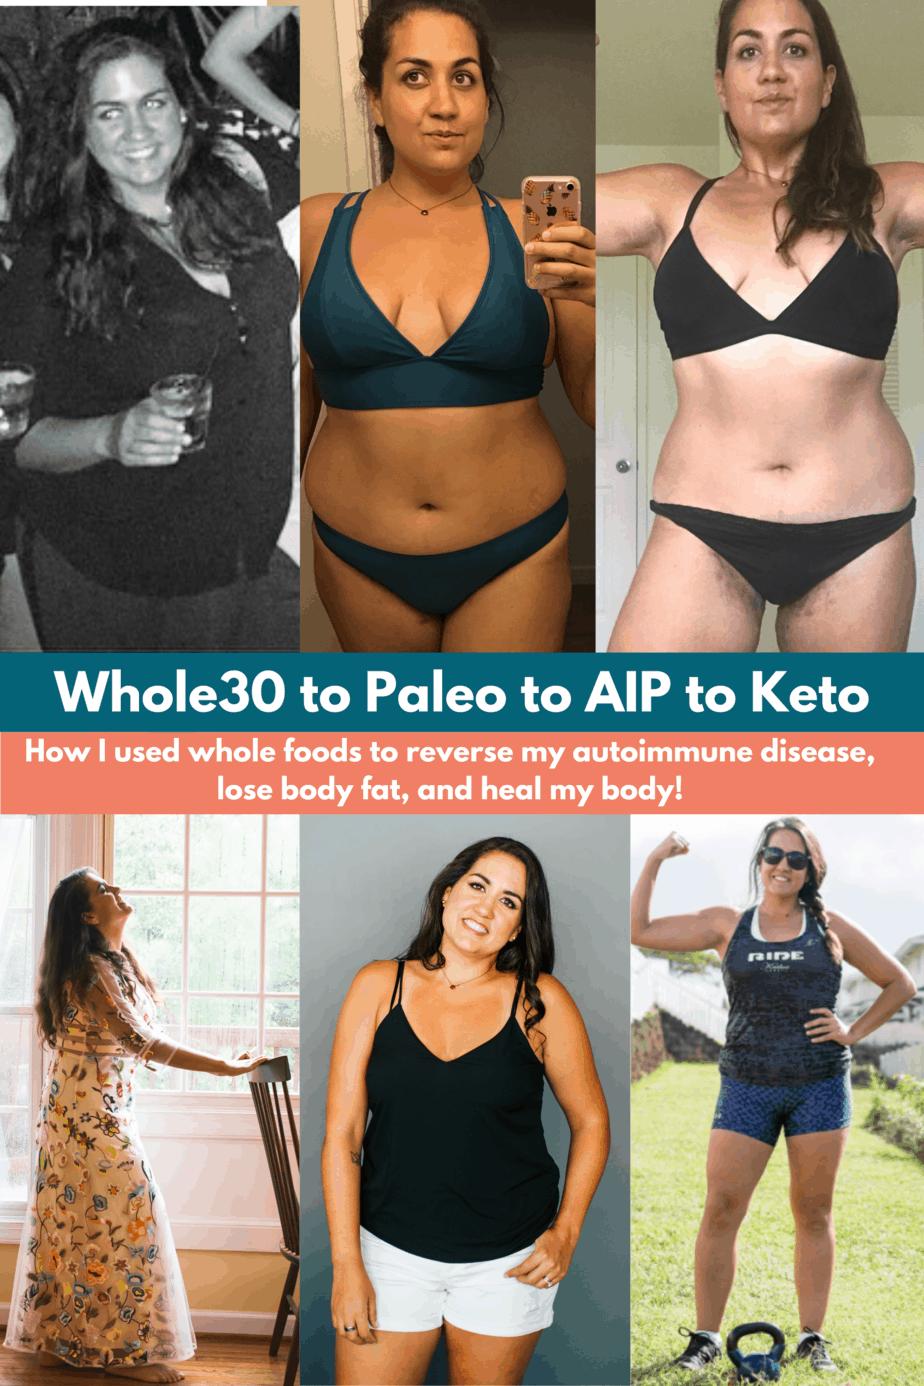 Paleo Diet Weight Loss Success Stories : paleo, weight, success, stories, Weight, Healing, Journey:, Helped